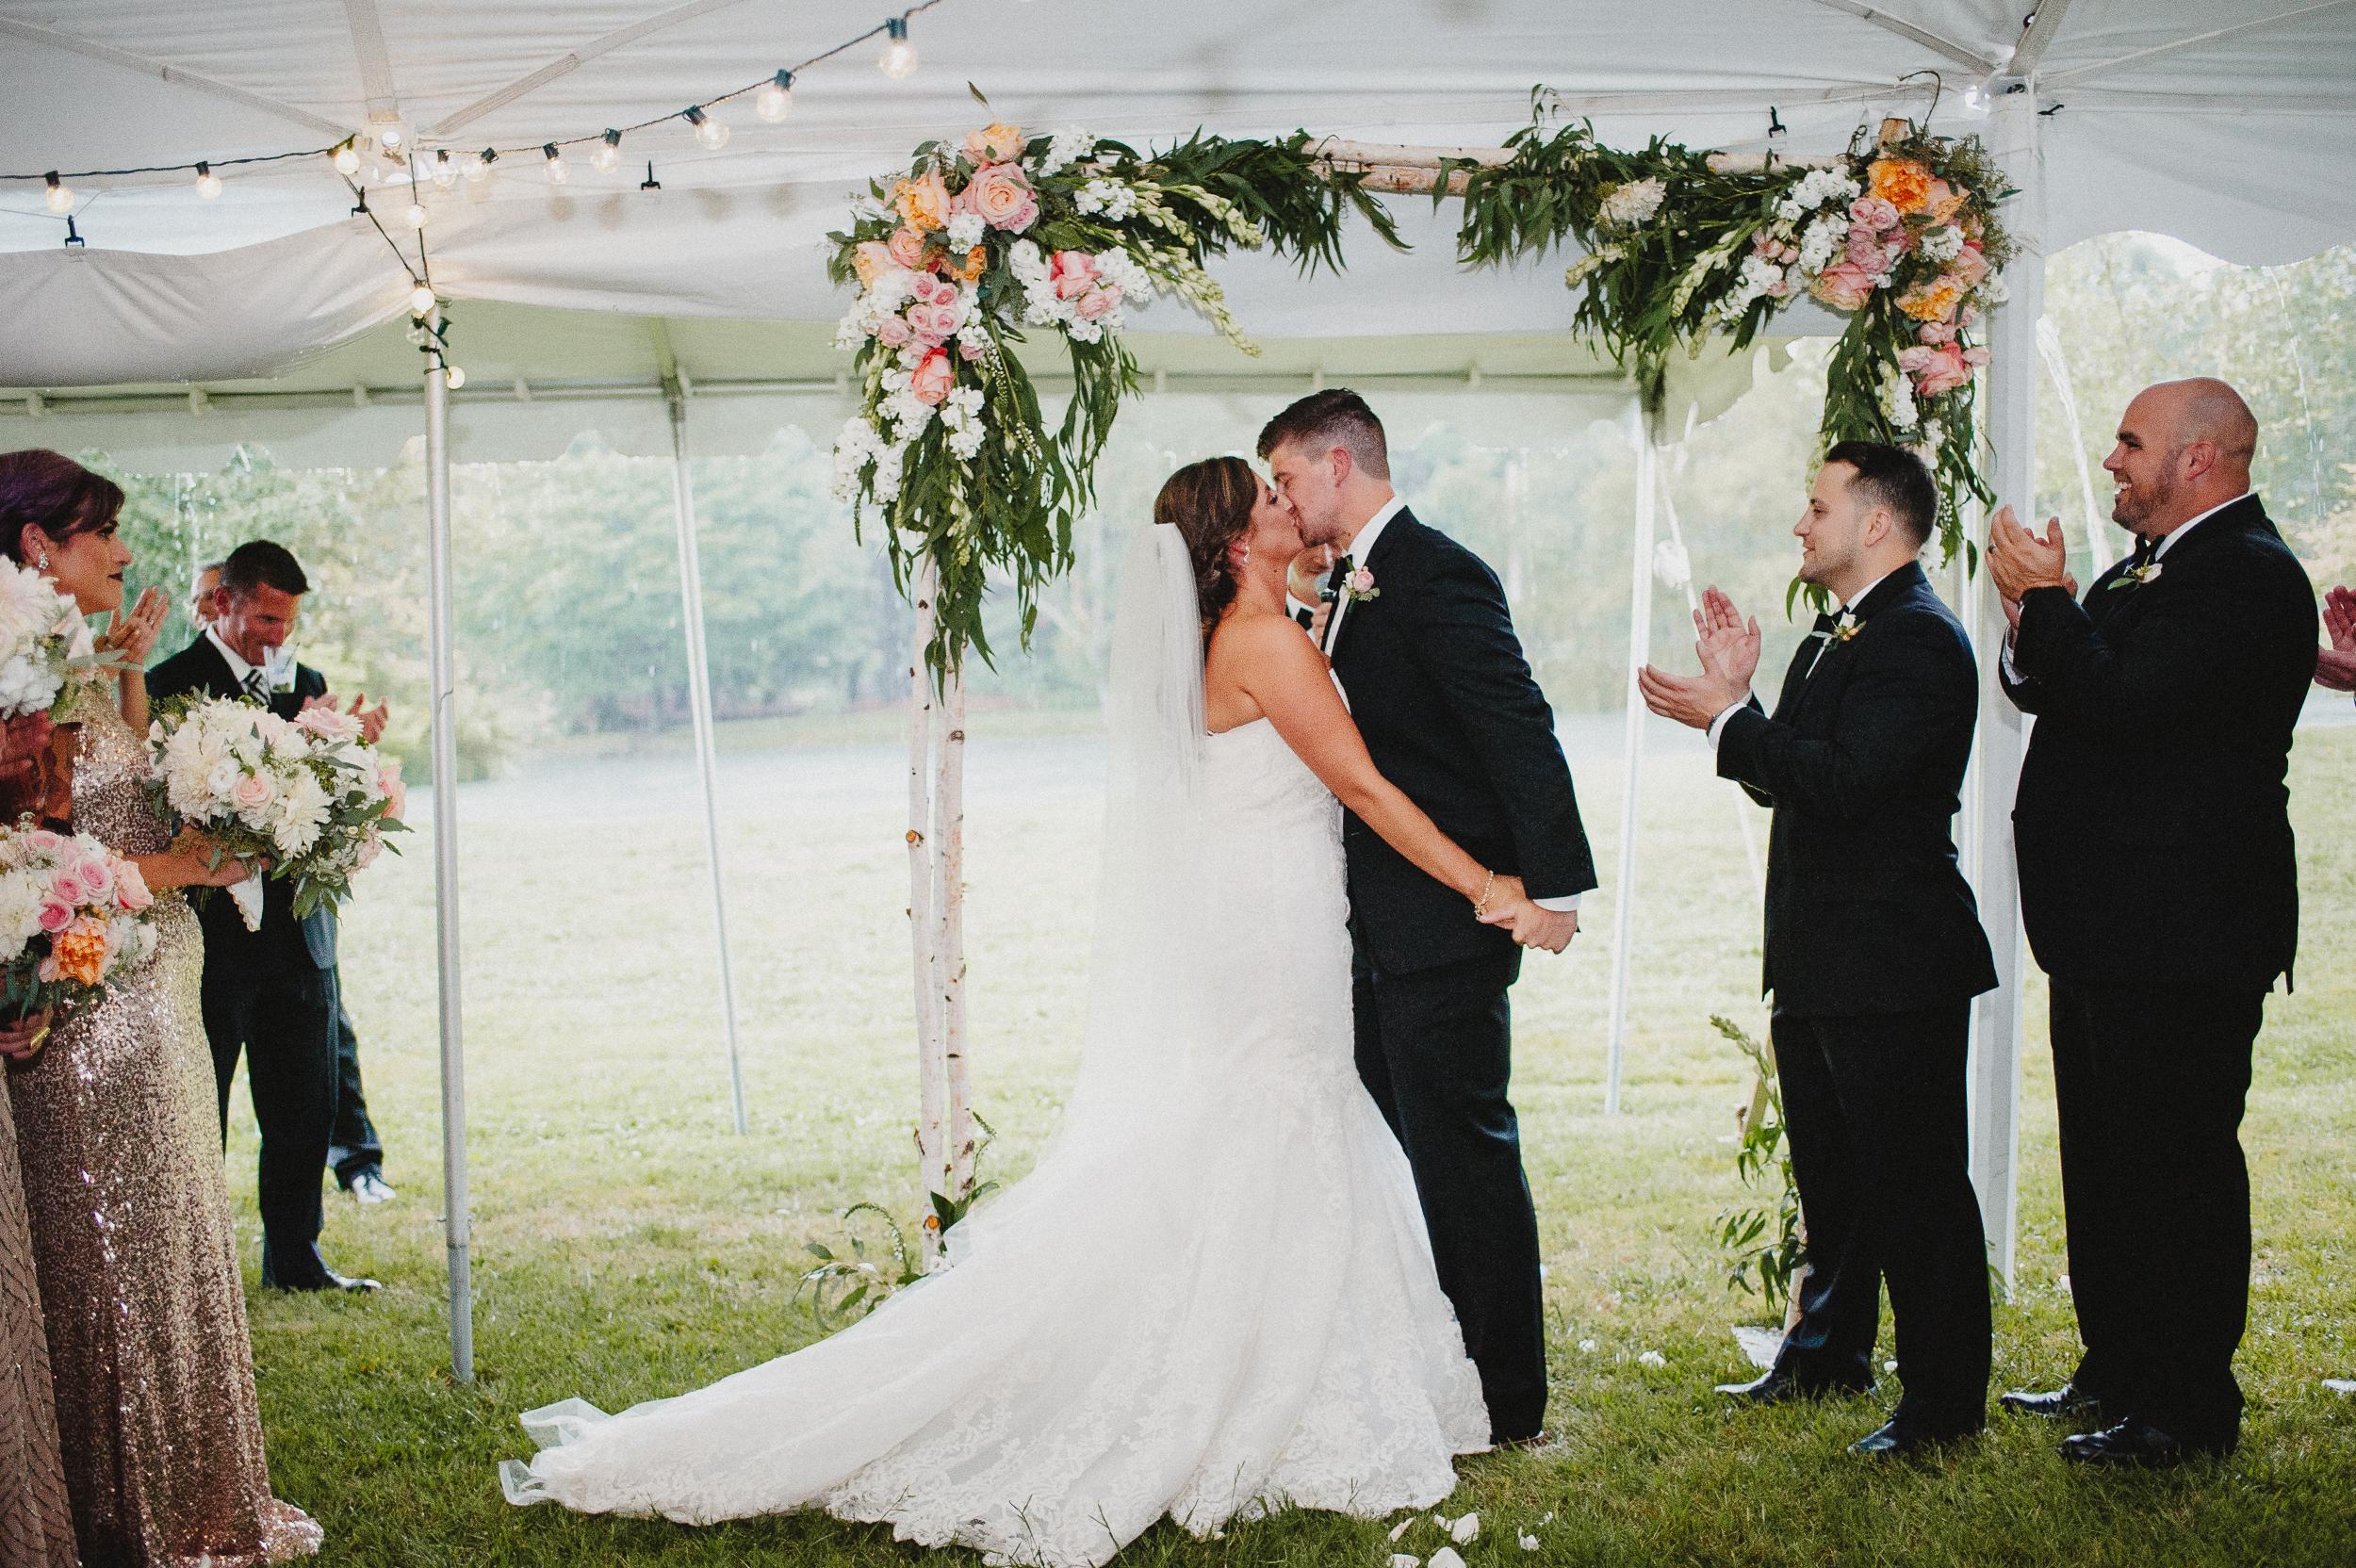 delaware-estate-wedding-photographer-pat-robinson-photography-96.jpg